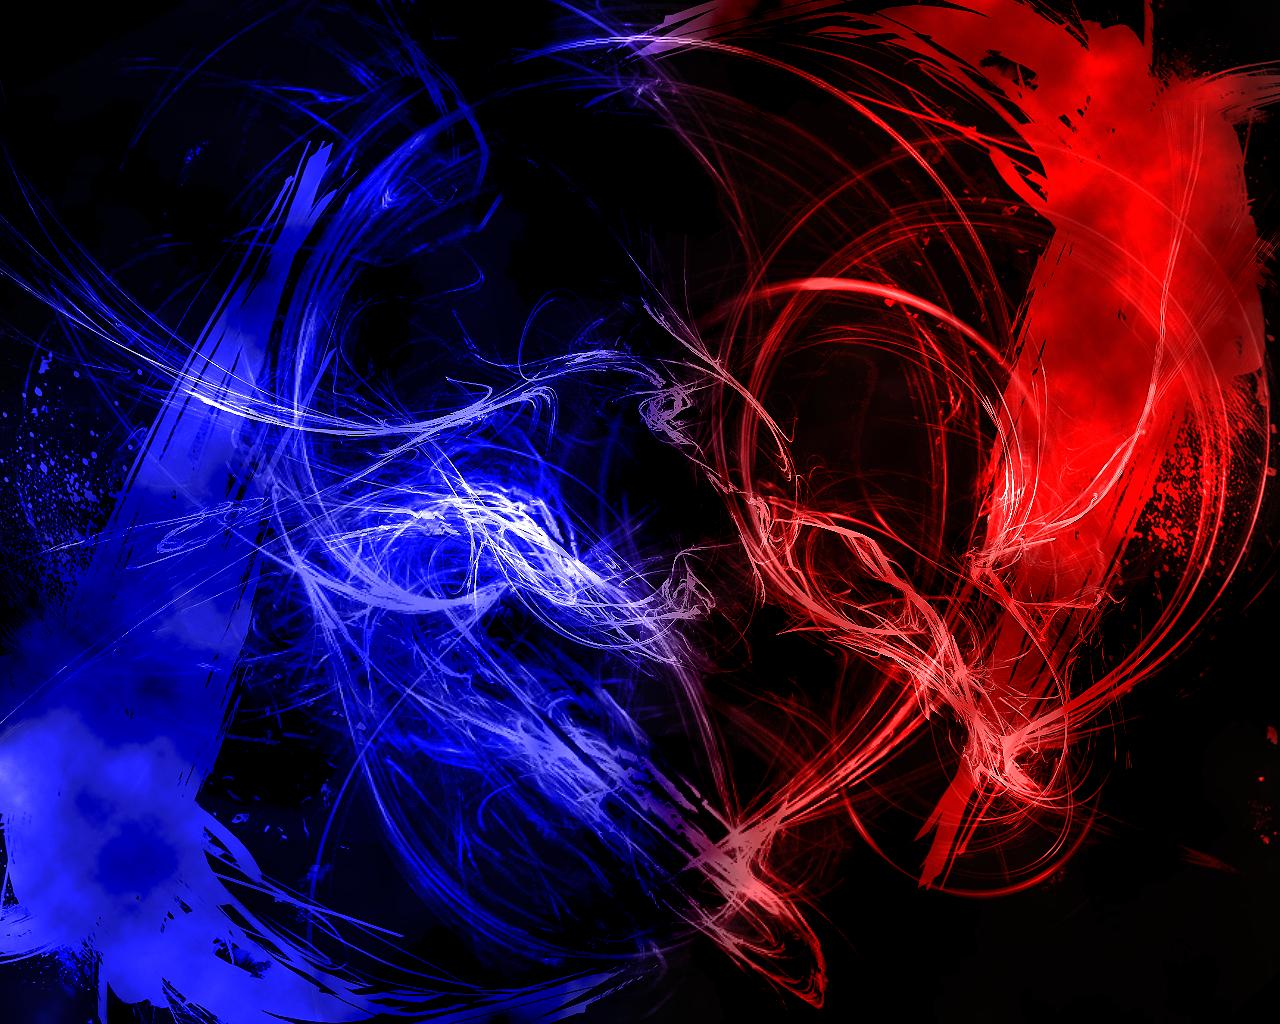 [77+] Red Vs Blue Wallpaper on WallpaperSafari